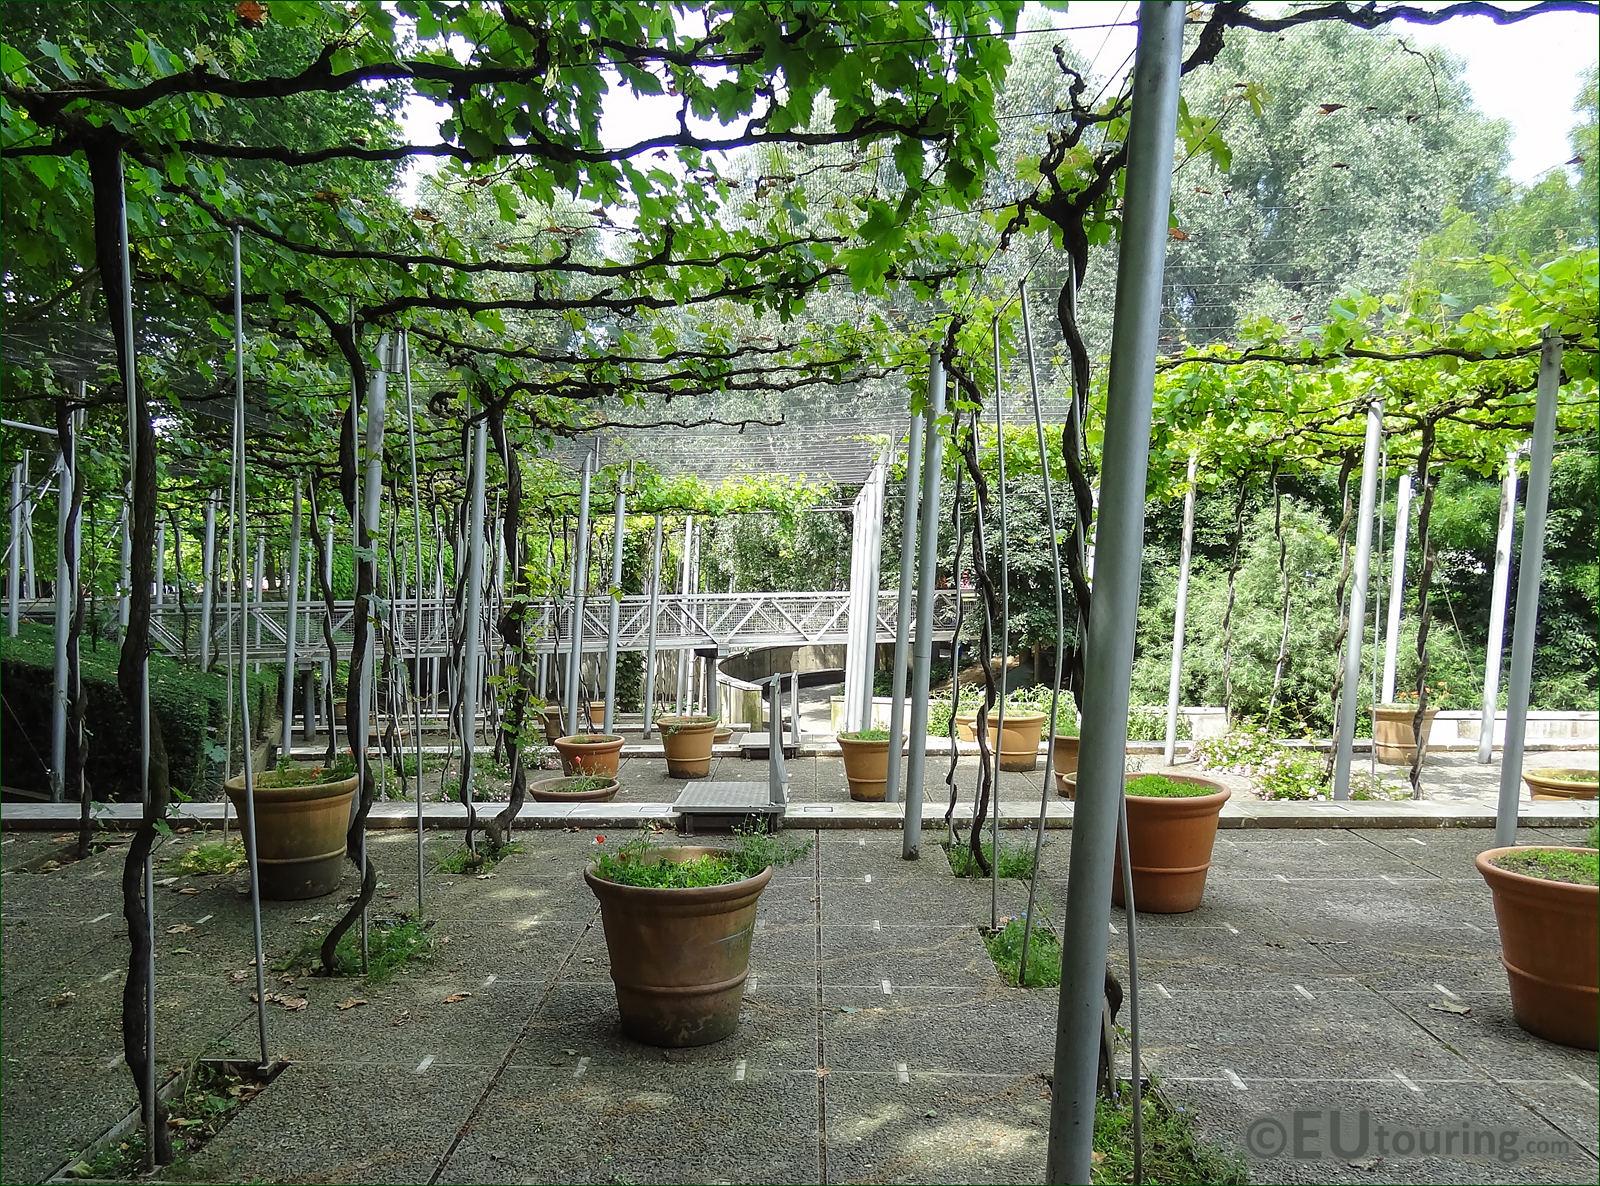 Hd photos of jardin de la treille vineyard inside parc de for Garden jardin